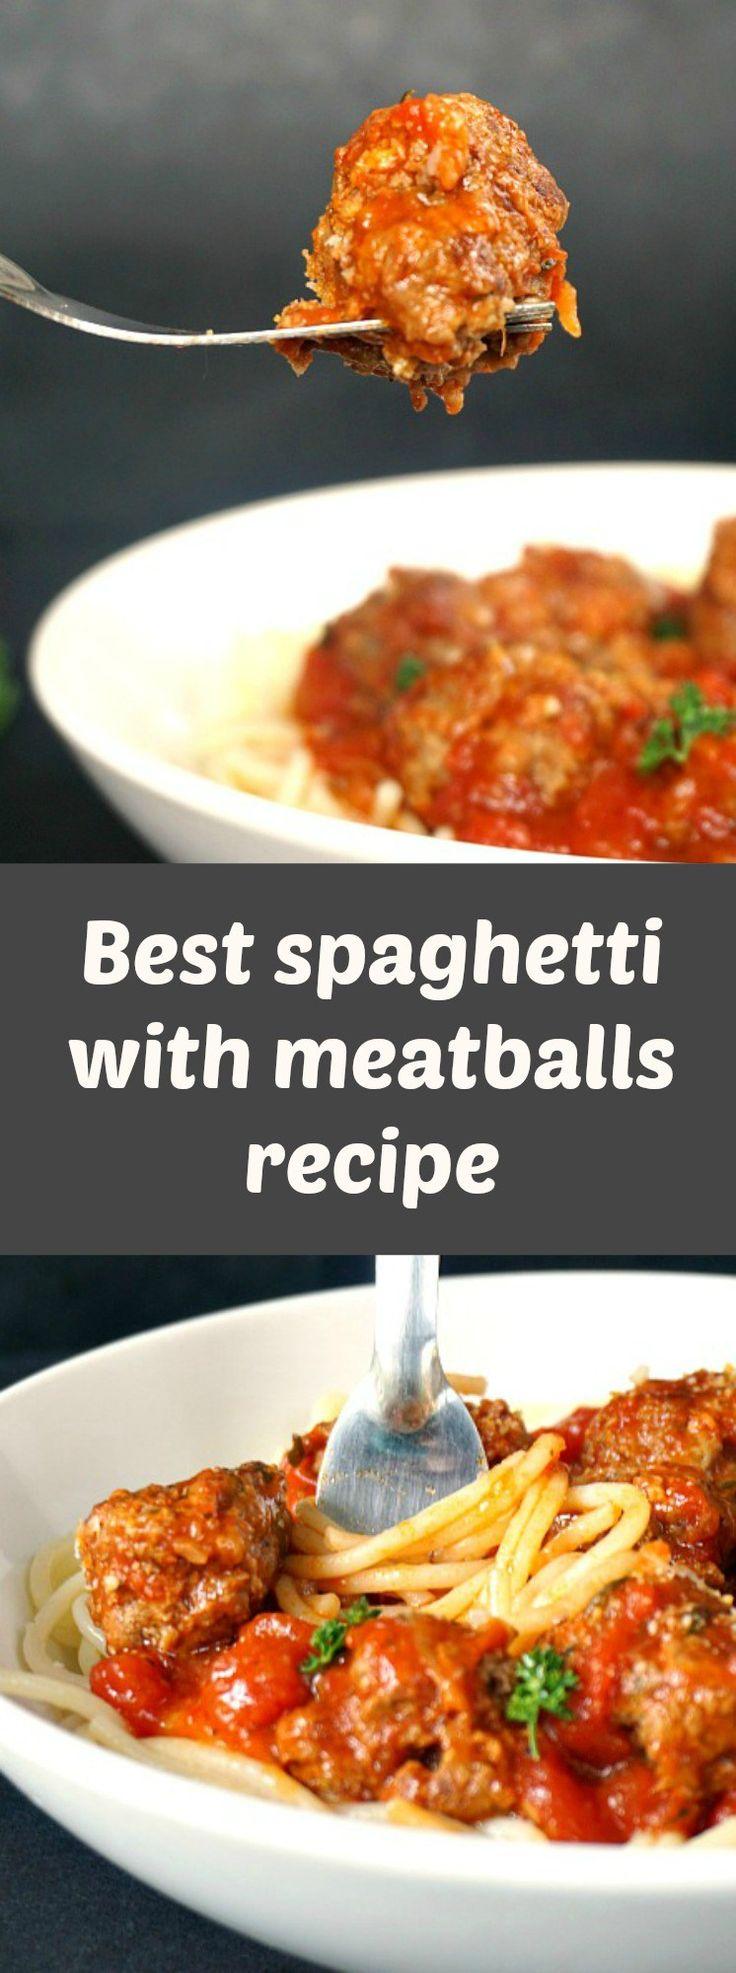 Best spaghetti with meatballs recipe